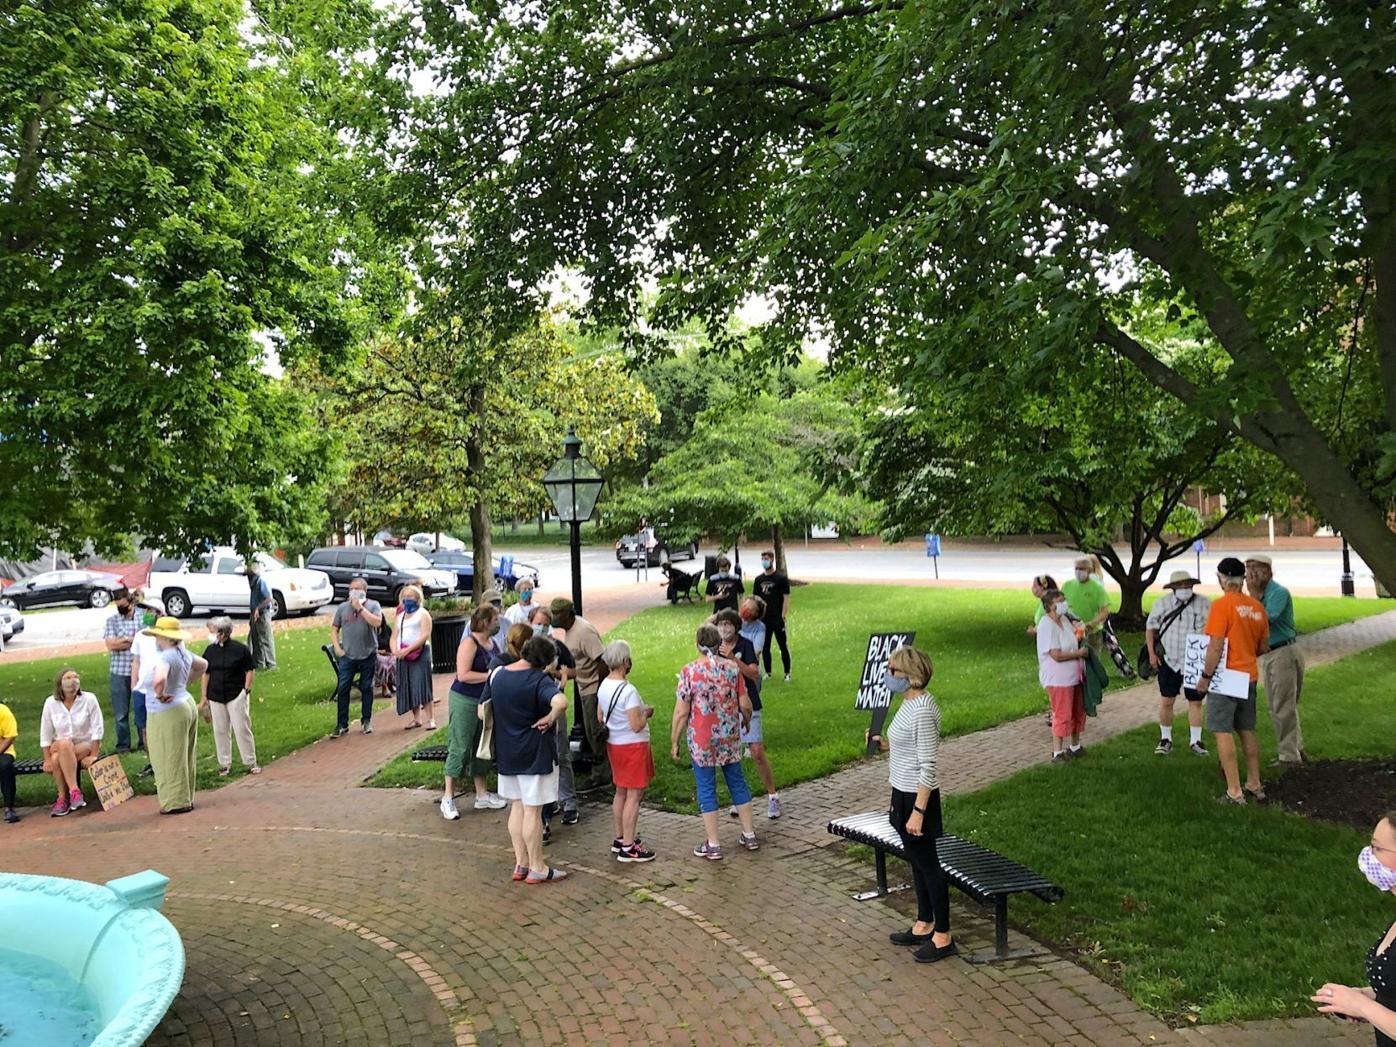 Camera Roll: Chestertown Prayer Walk